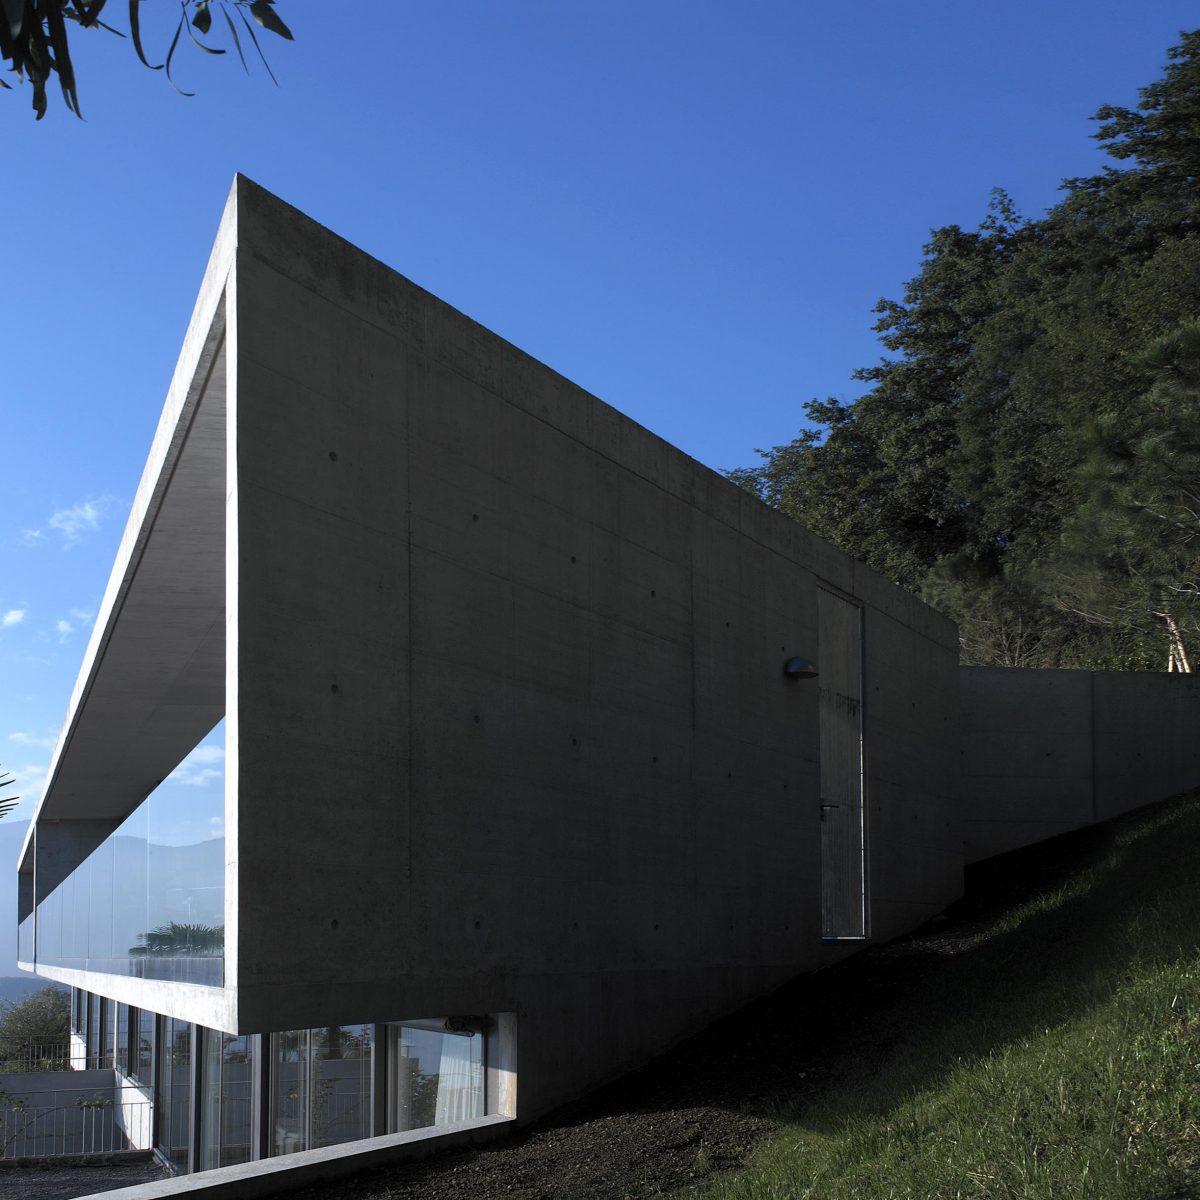 Villa unifamiliare, Aldesago